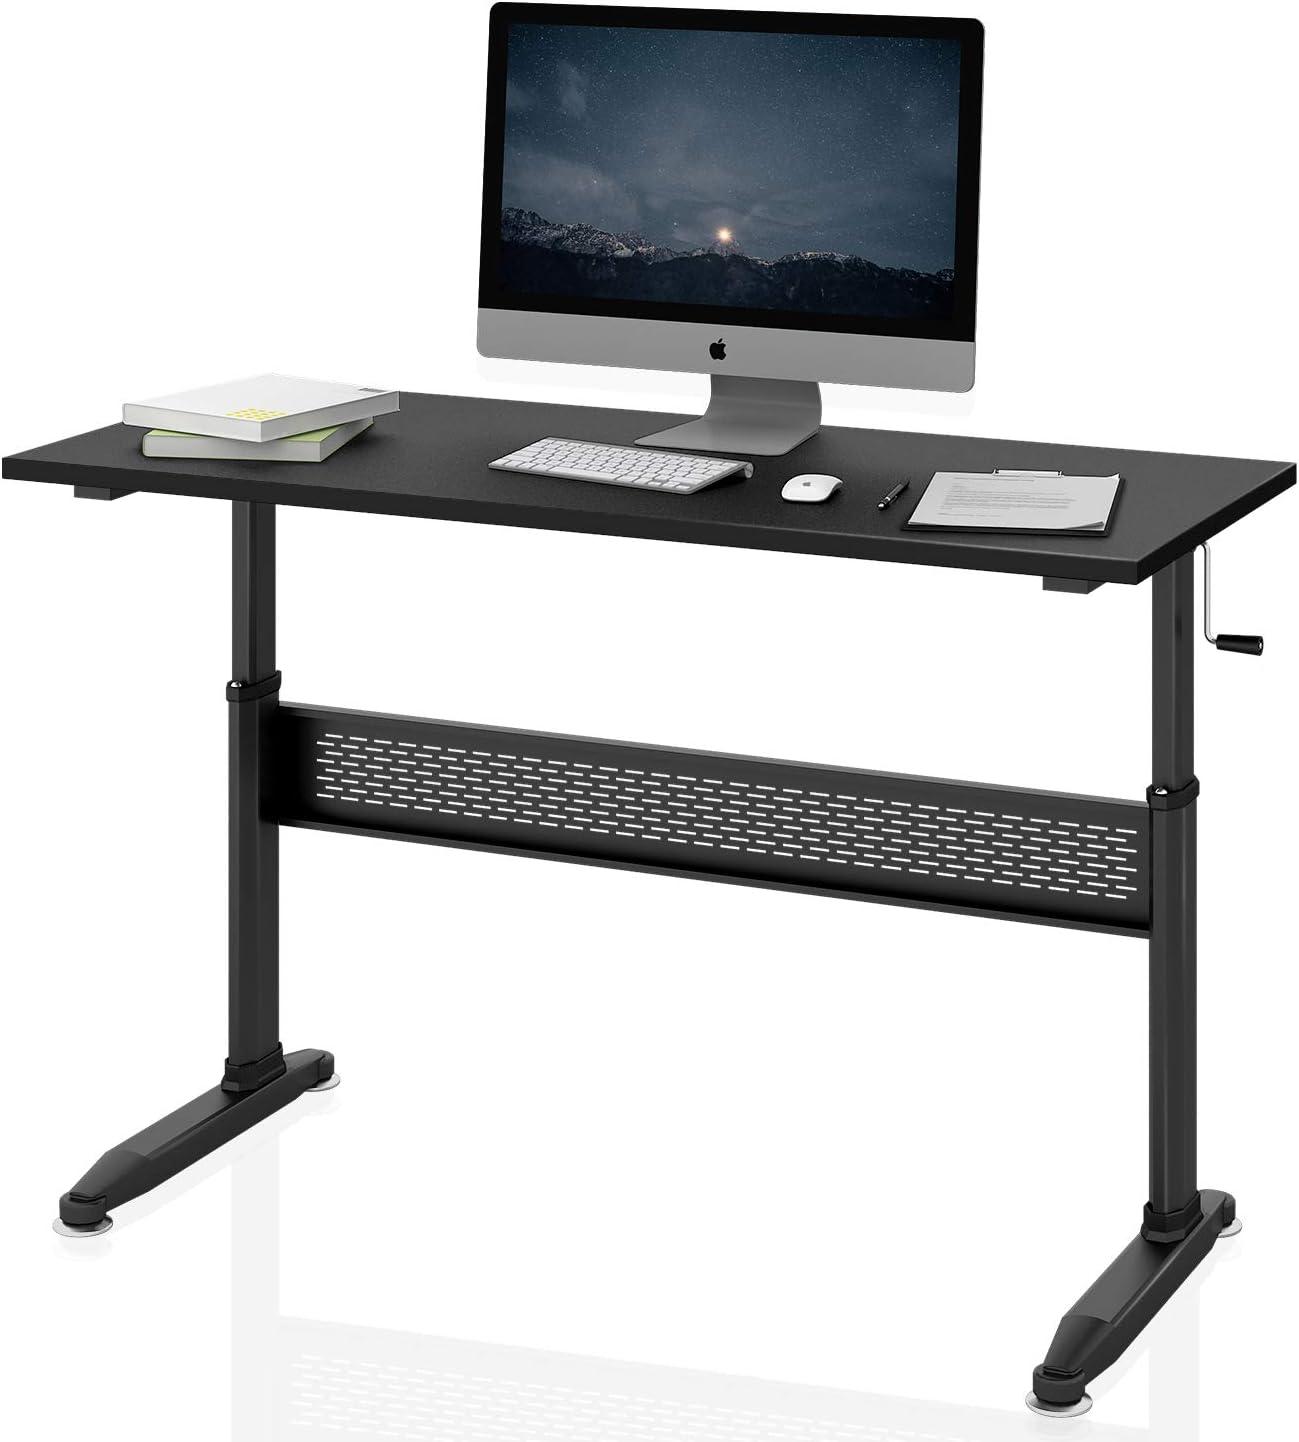 DEVAISE Adjustable Height Standing Desk 55 Inch with Crank Handle/Black